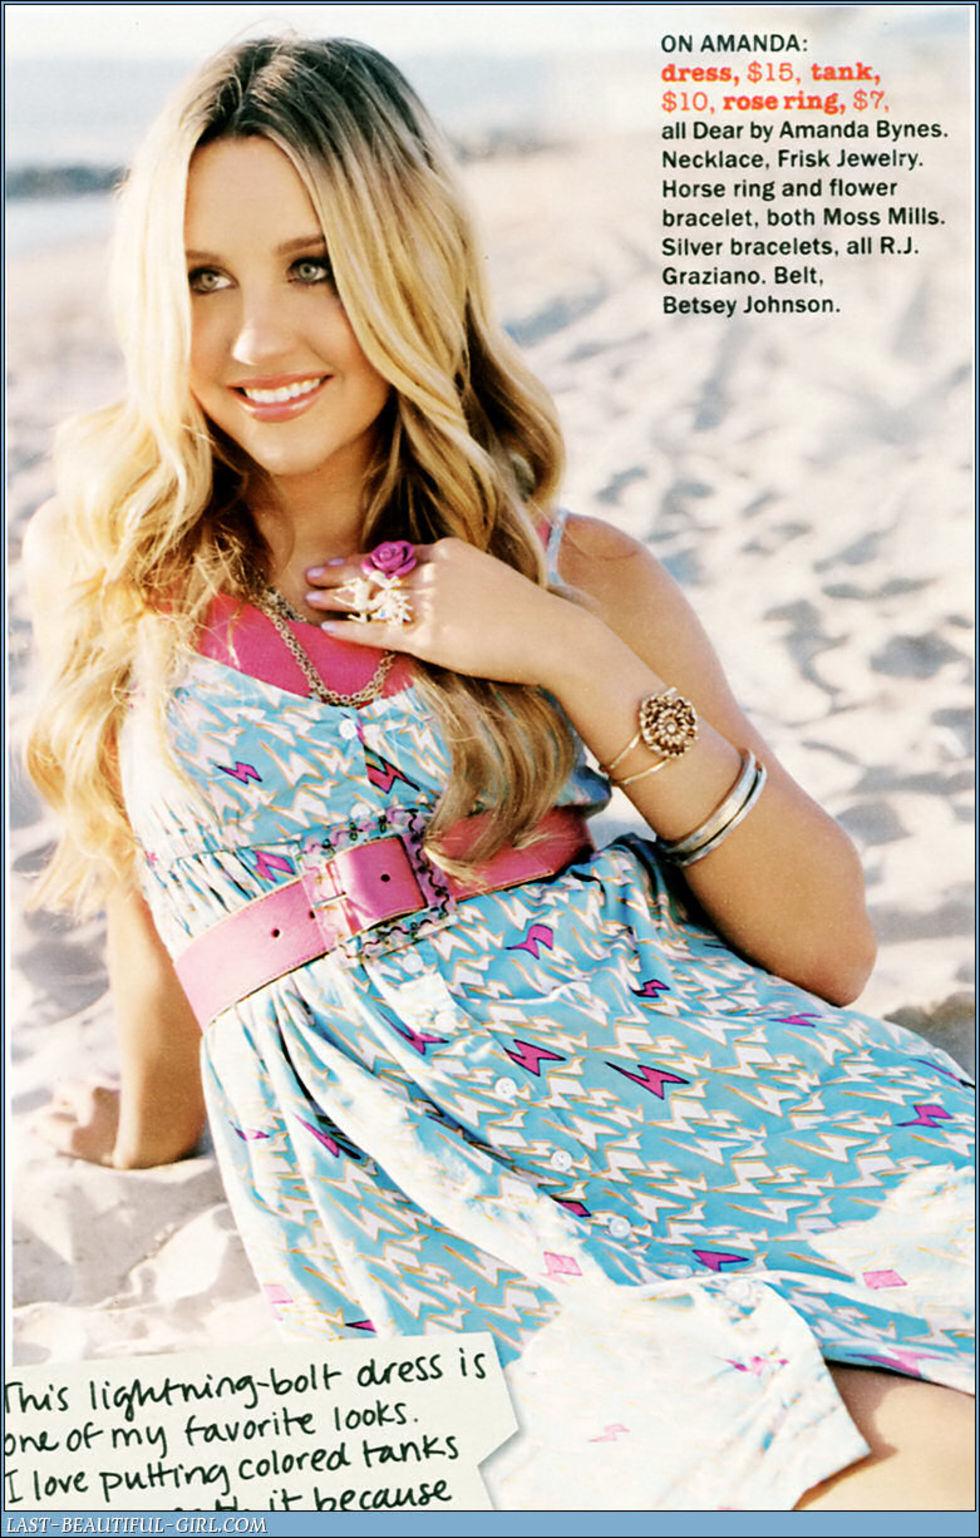 amanda-bynes-seventeen-magazine-may-2008-01